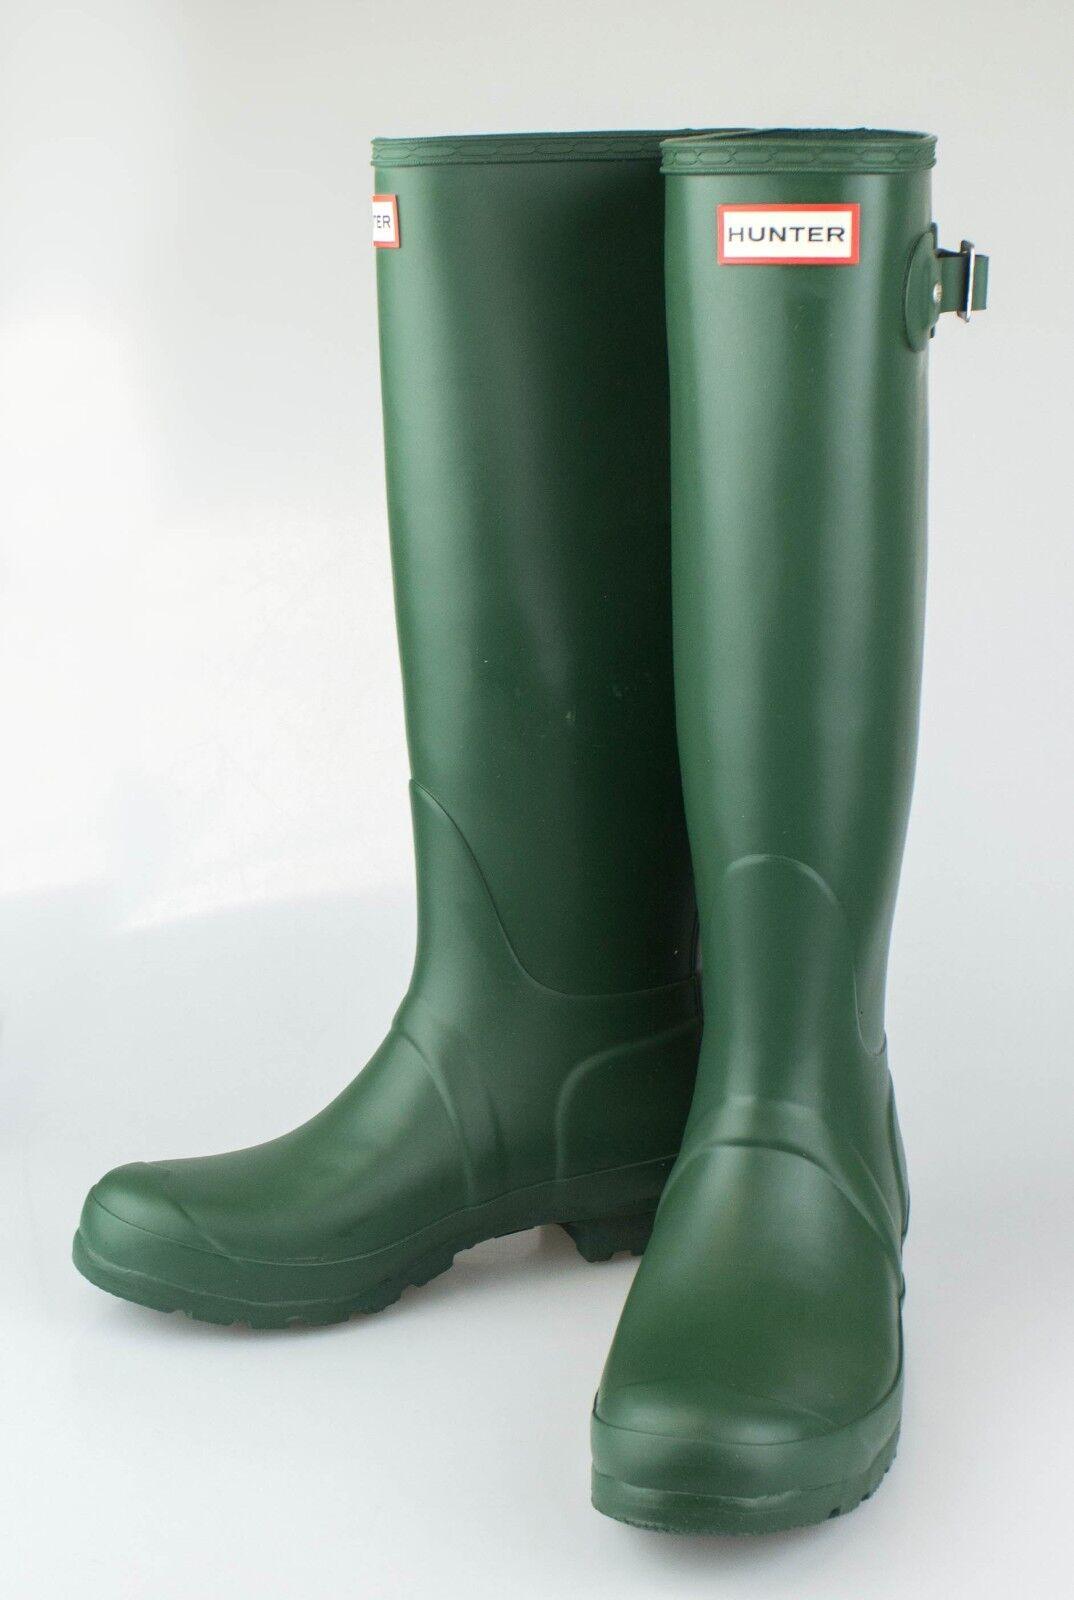 NIB HUNTER Hunter Grün Original Tall Rain Stiefel schuhe Größe 5 US 3 UK 36 EU